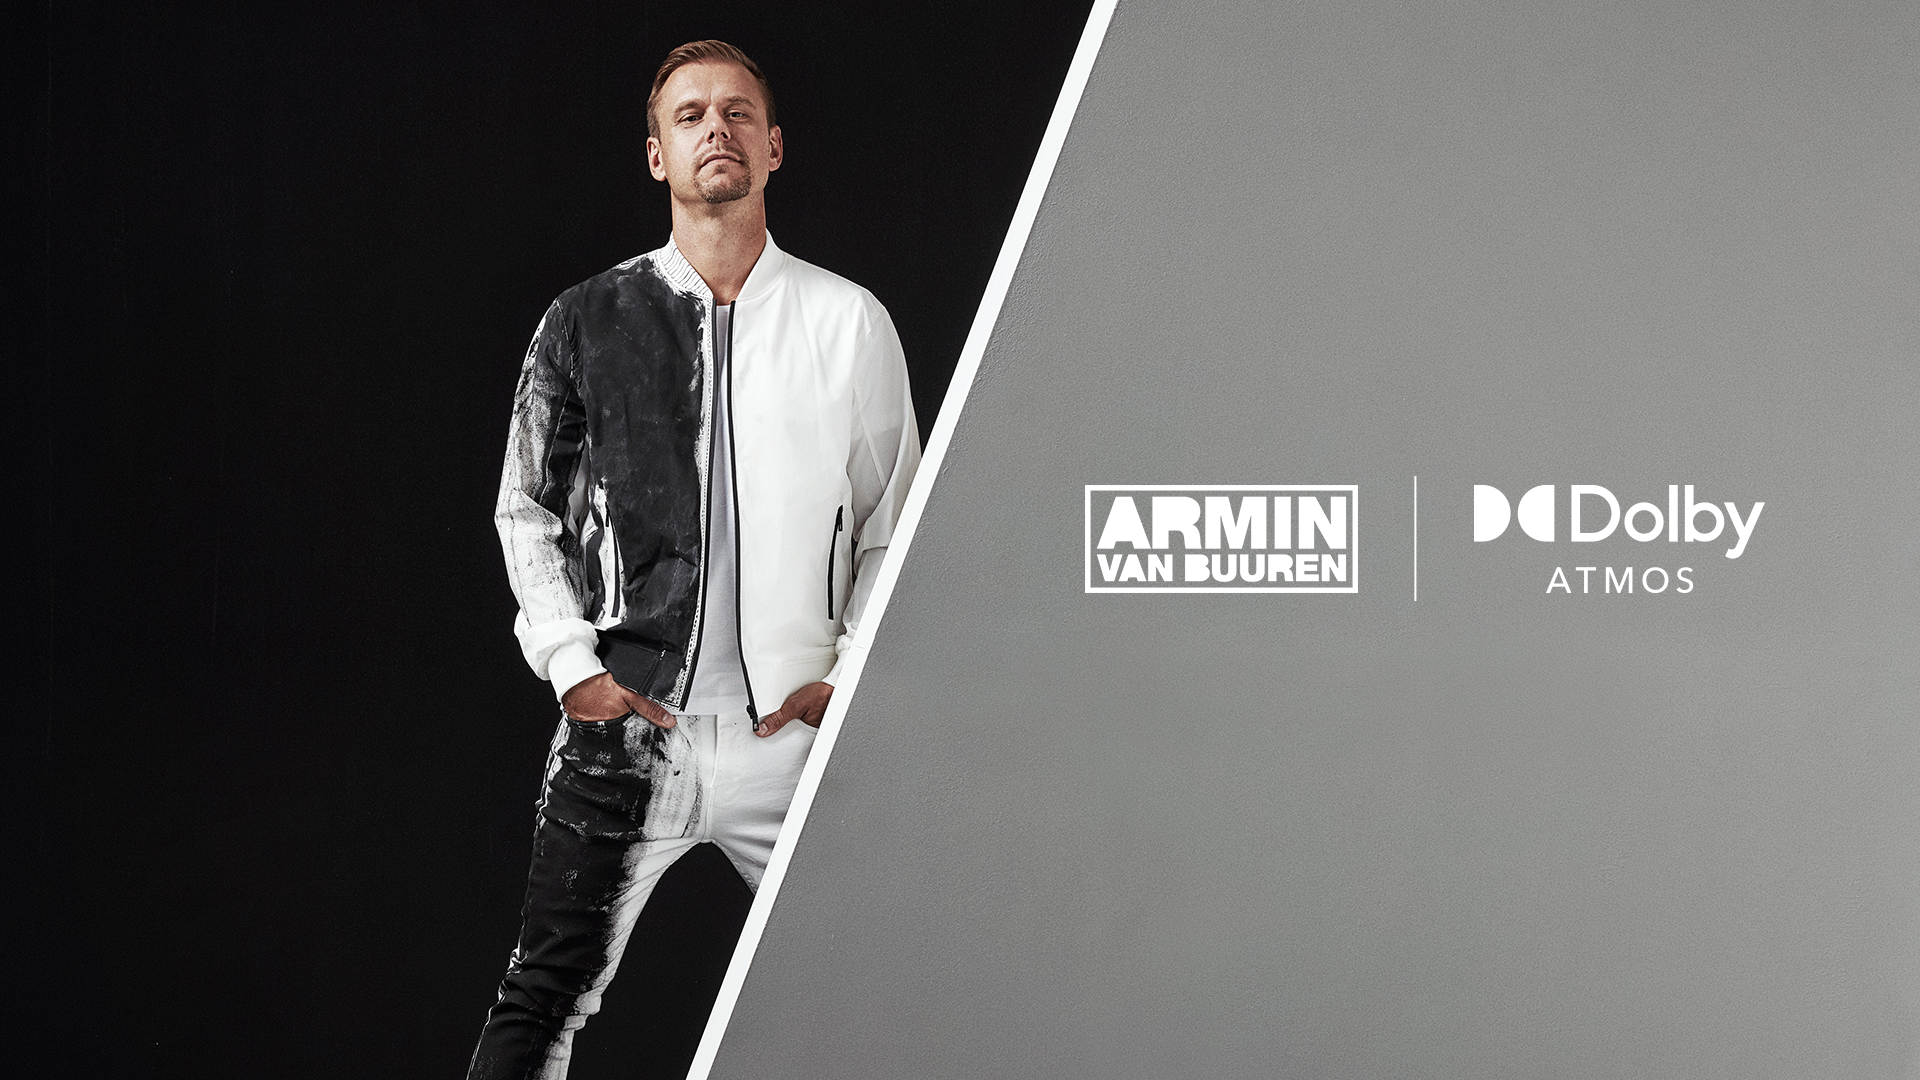 Trance music legend Armin van Buuren remixes seventh studio album in Dolby Atmos